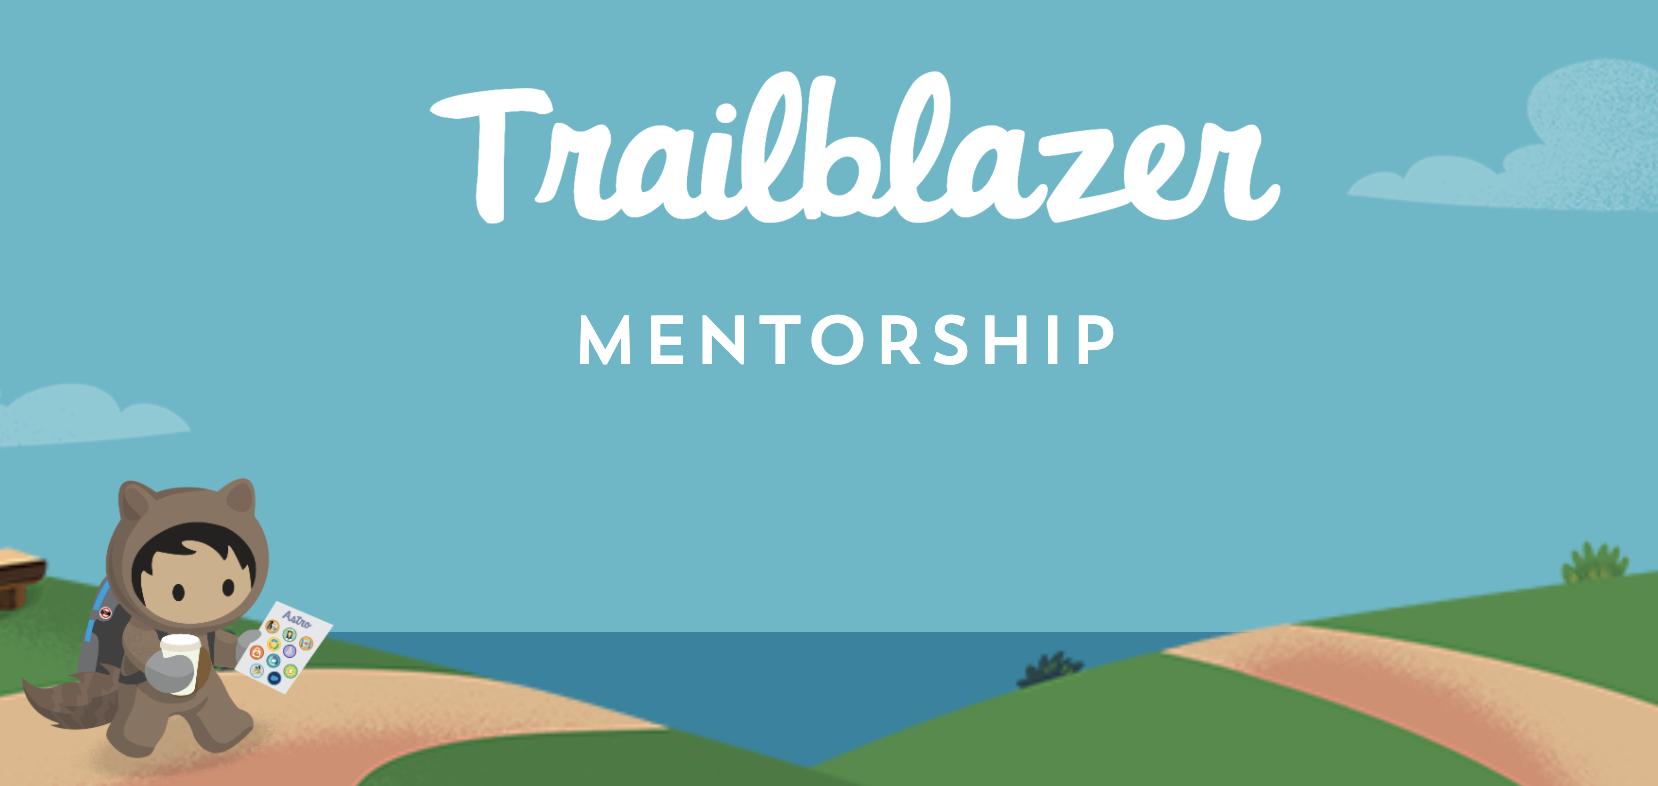 Tigh Loughhead is a Trailblazer Mentor and Salesforce MVP